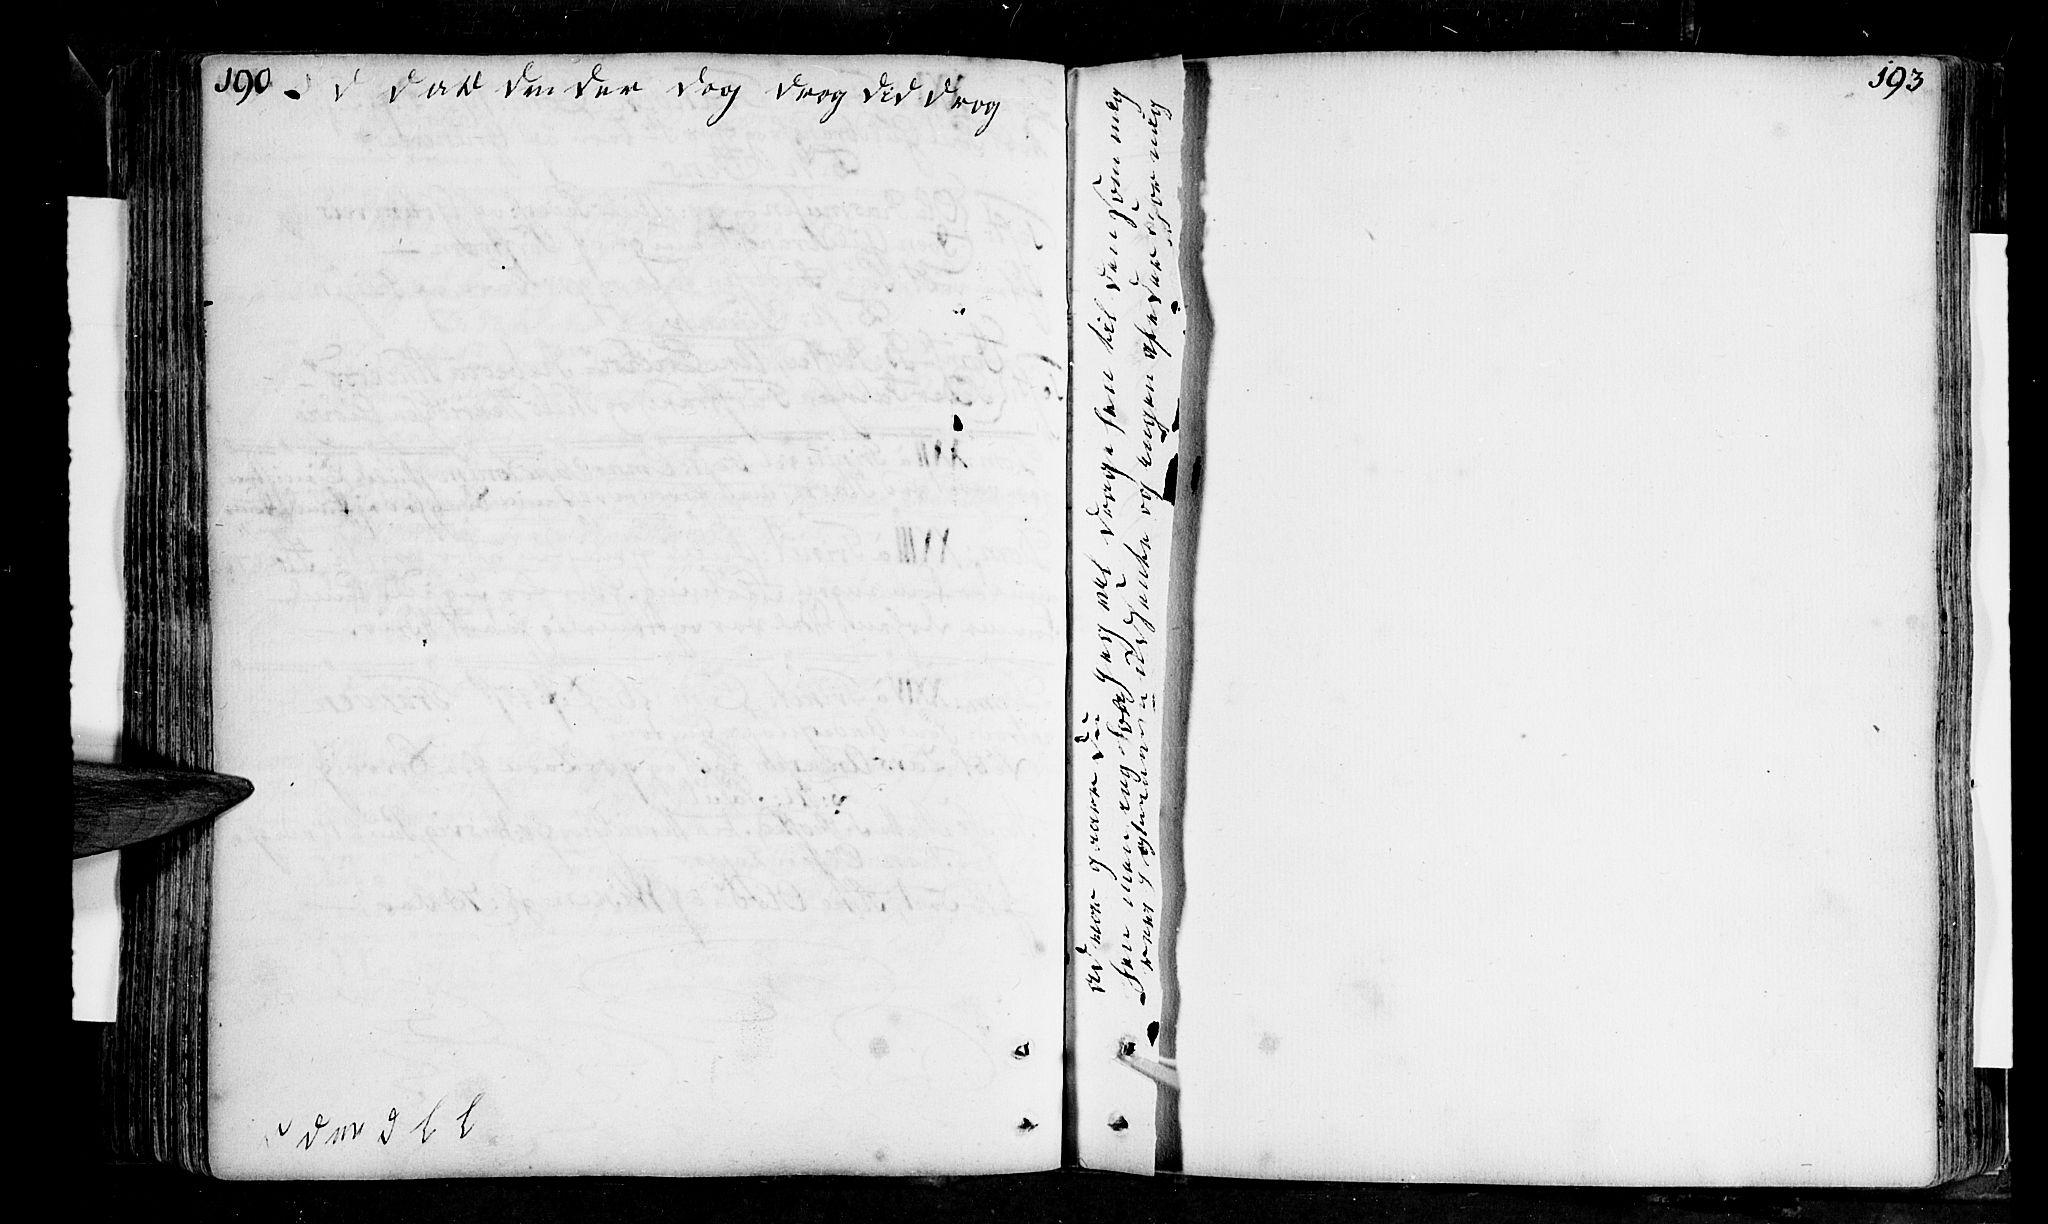 SATØ, Tranøy sokneprestkontor, I/Ia/Iaa/L0001kirke: Ministerialbok nr. 1, 1757-1773, s. 190-191